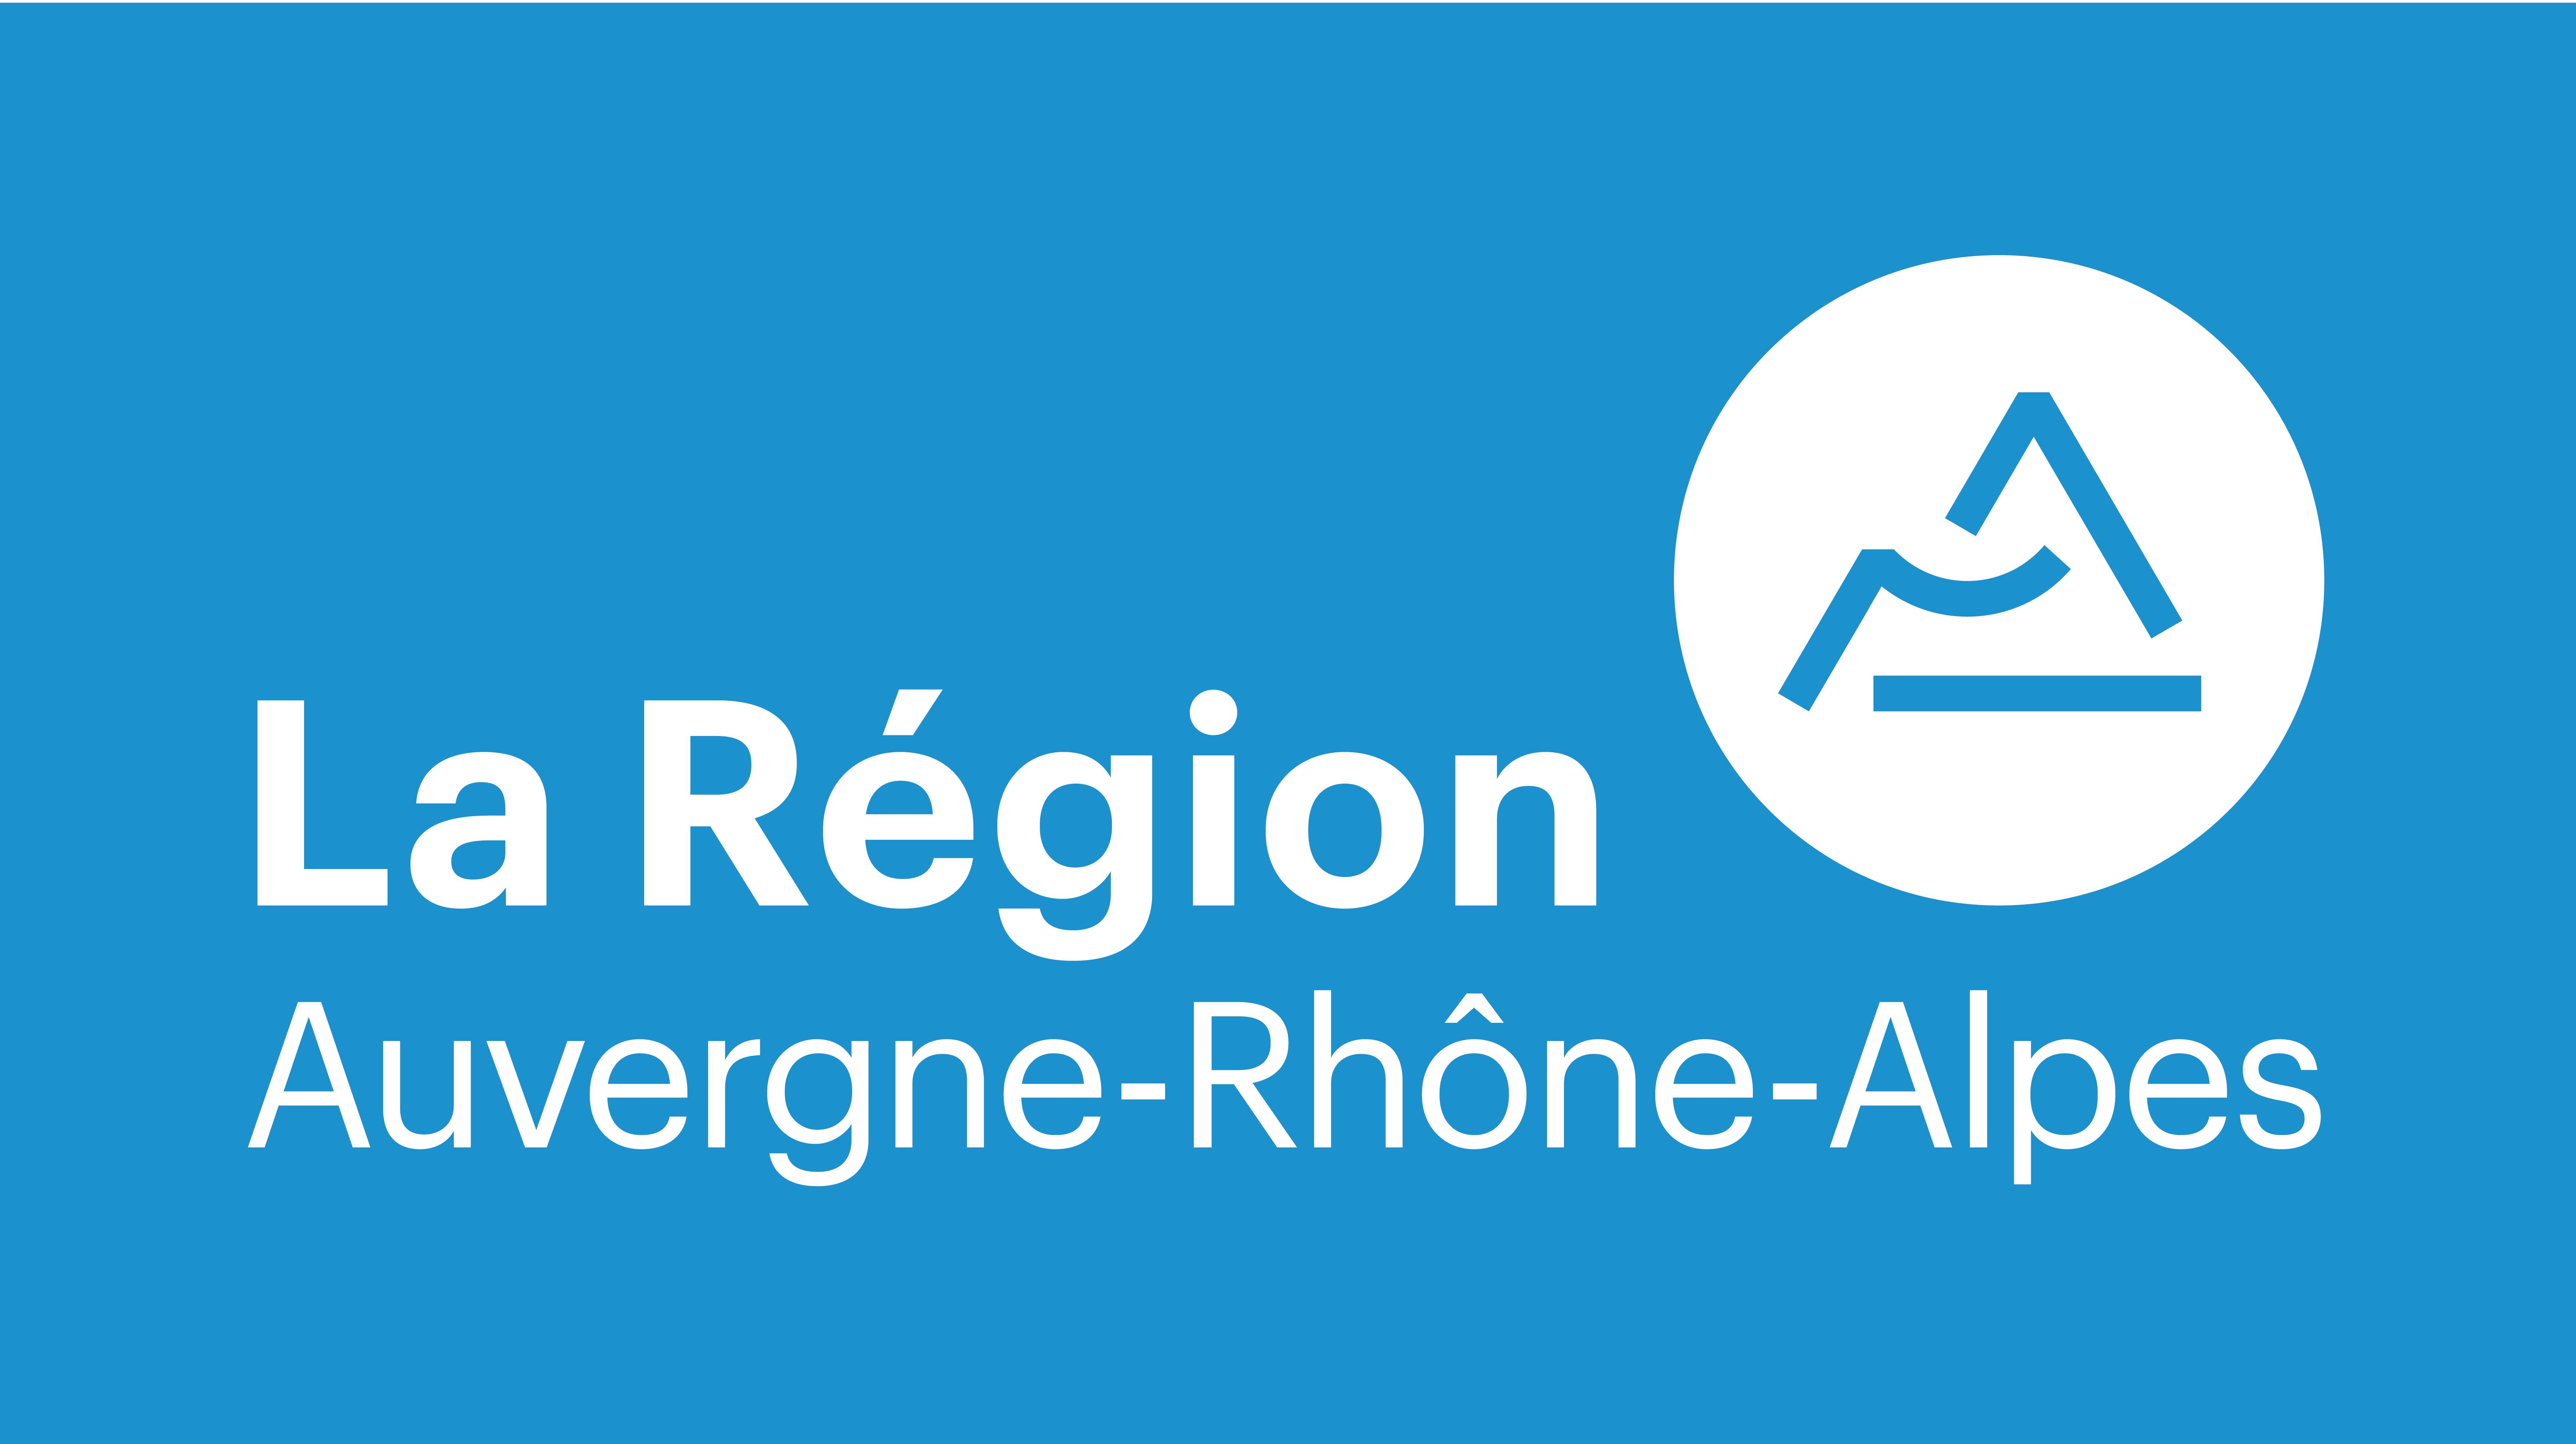 Auvergne-Rhône-Alpes